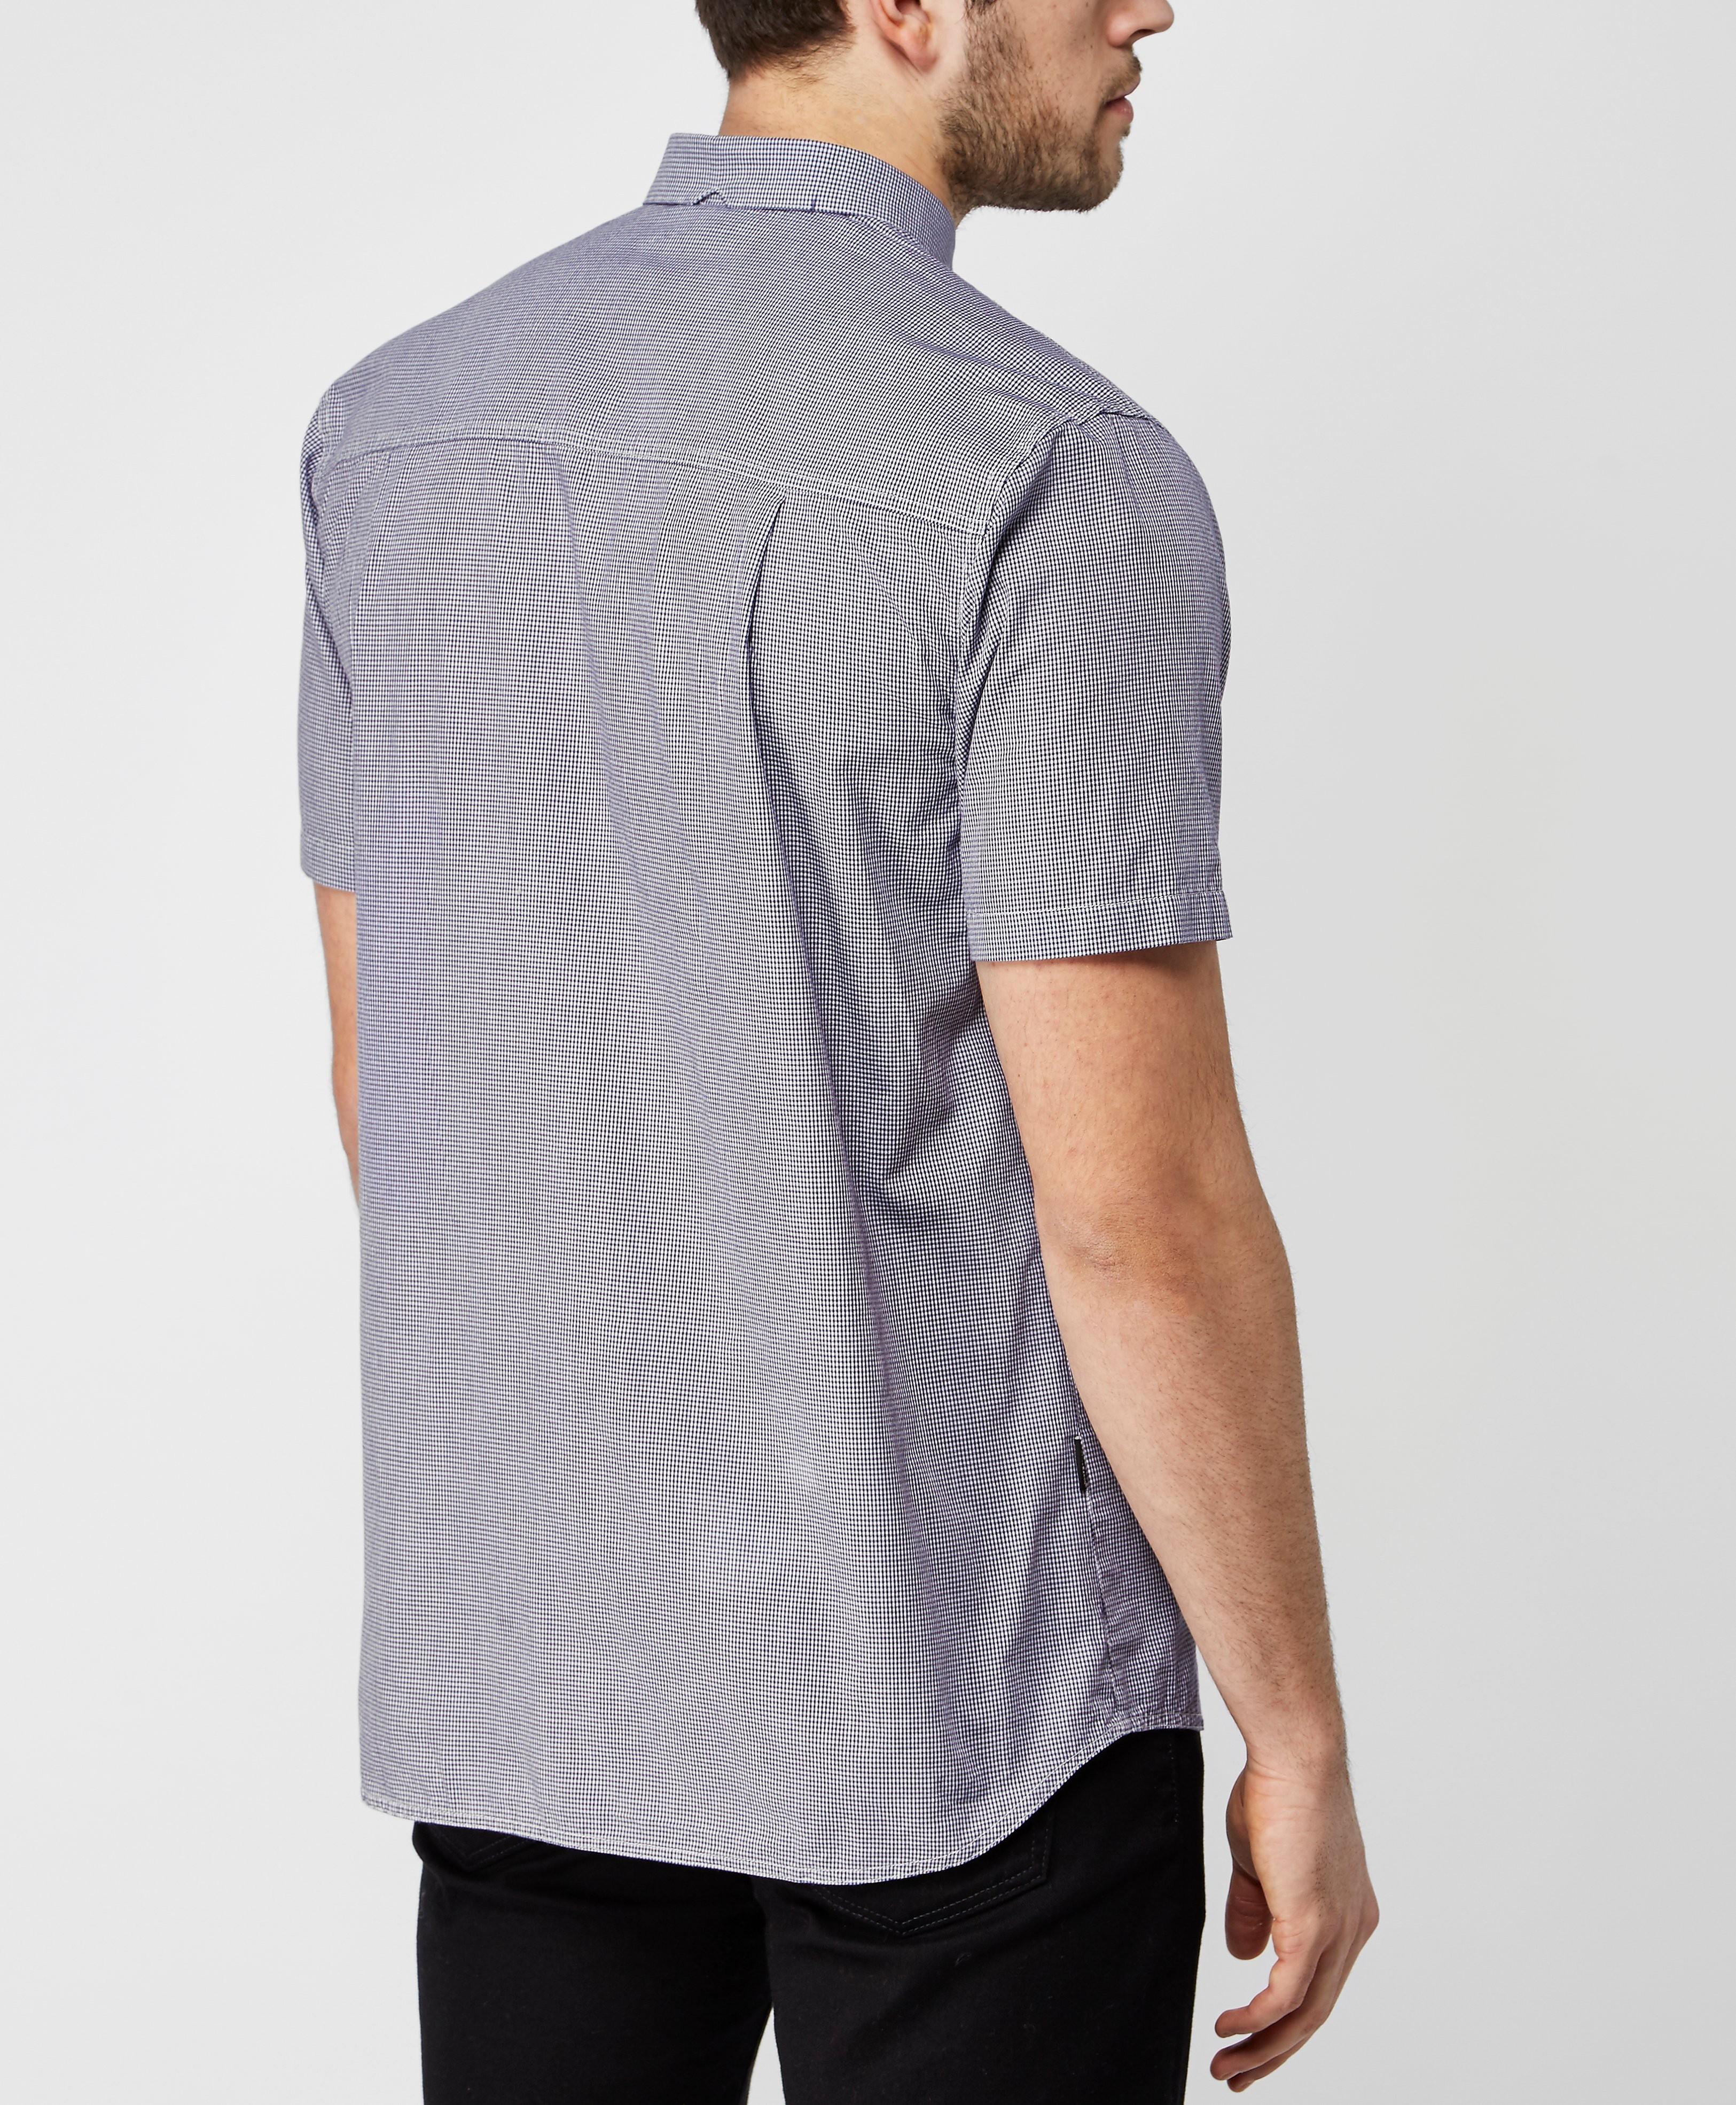 One True Saxon Patting Shirt - Exclusive